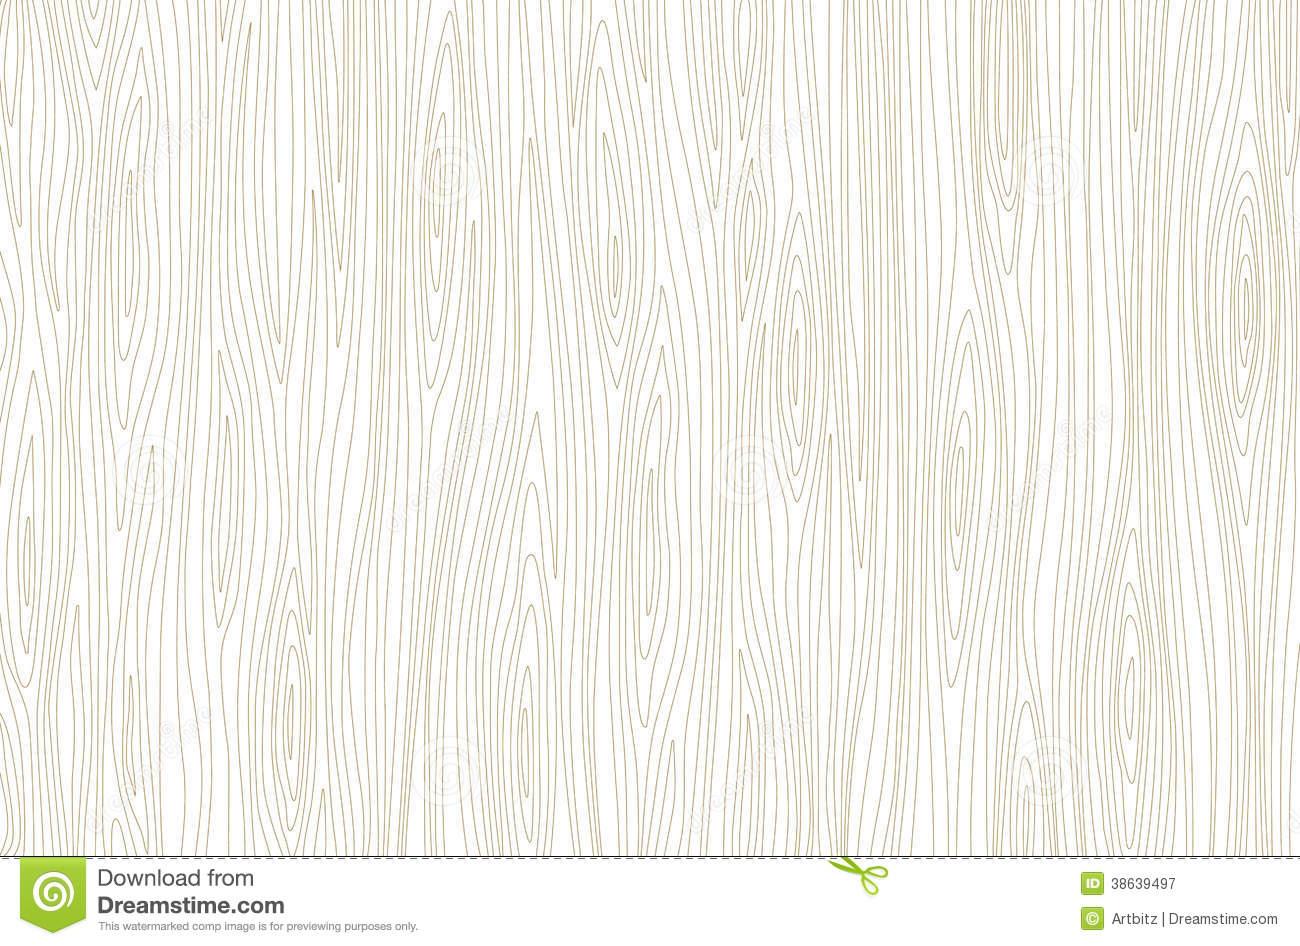 Wood Grain Vector Free Download